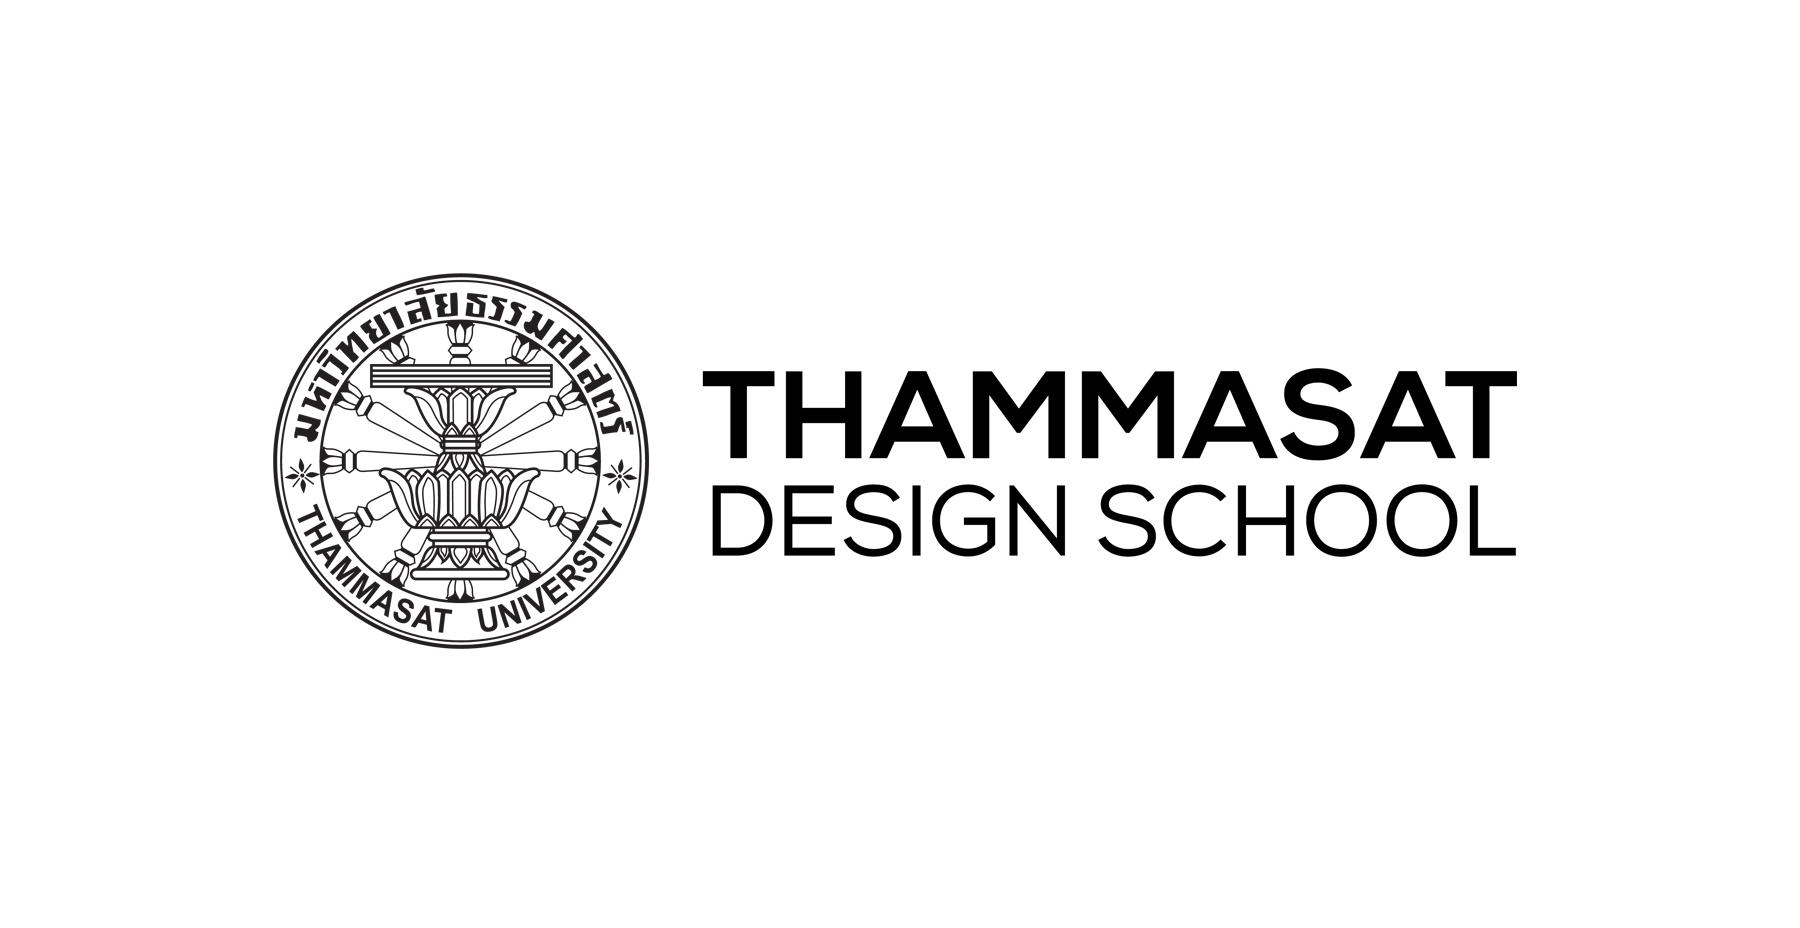 Thammasat Design School